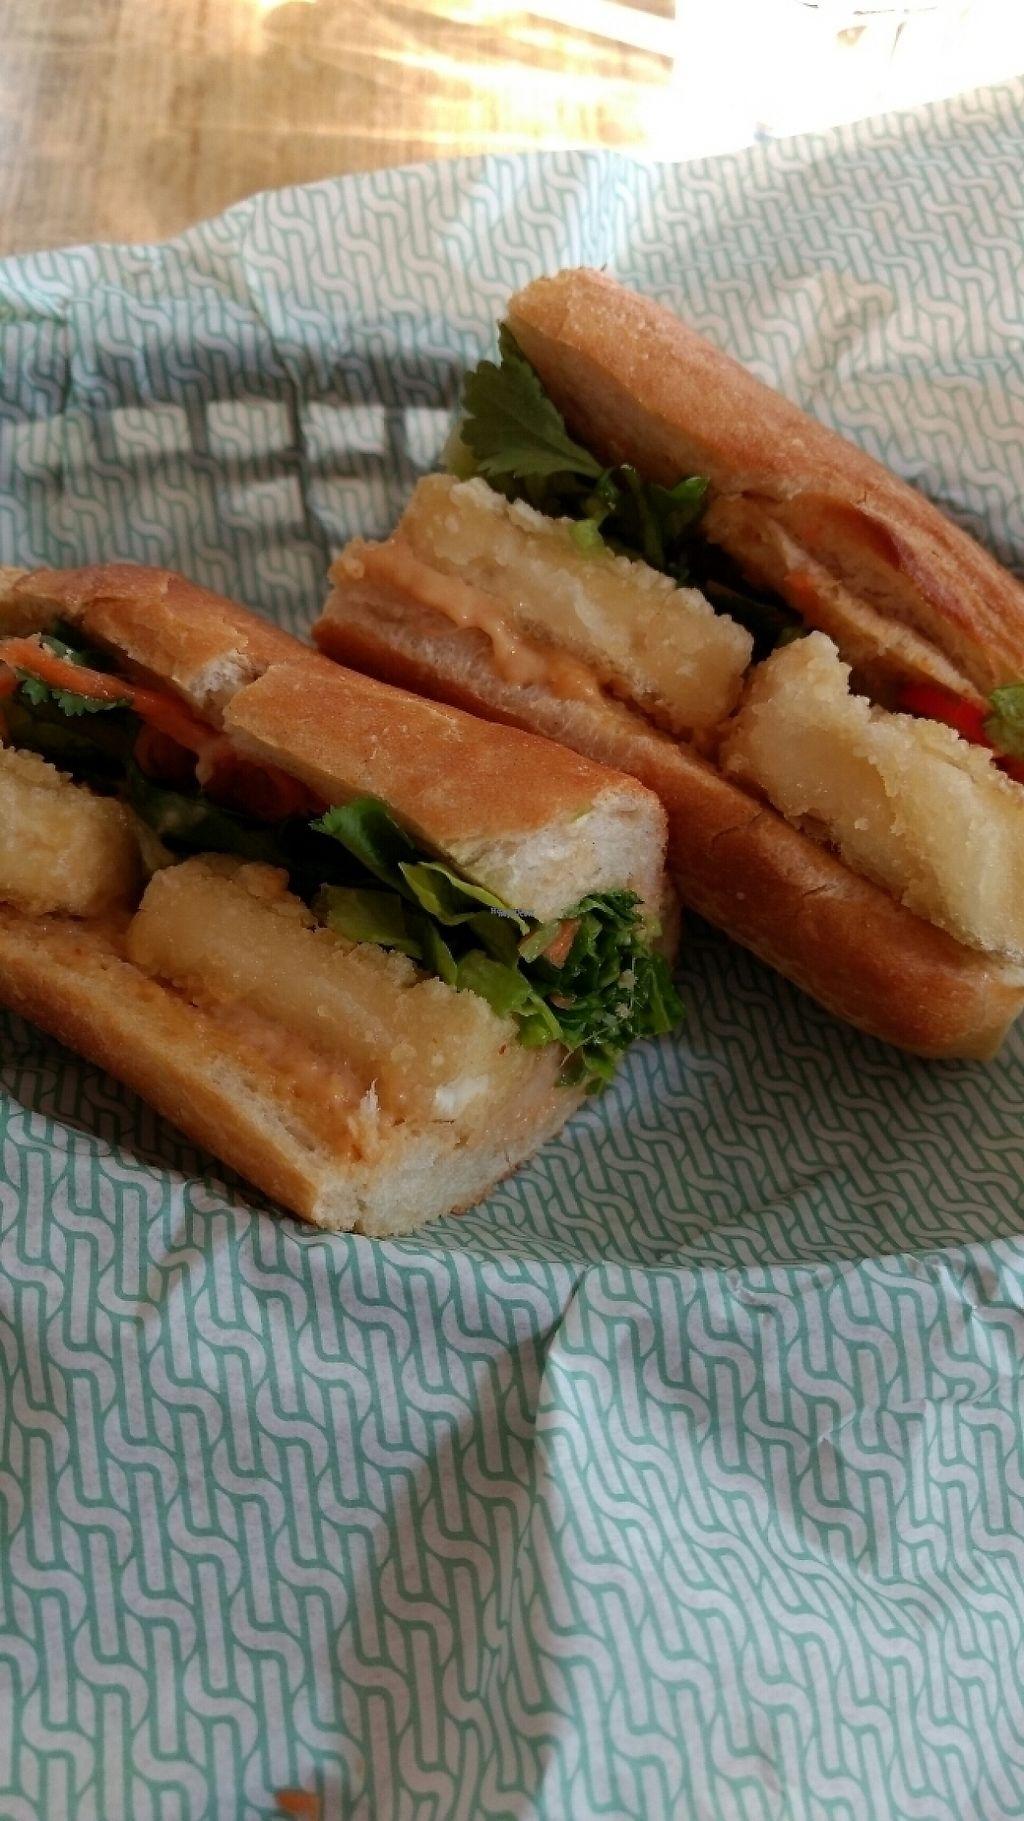 "Photo of Saiko Kitchen  by <a href=""/members/profile/craigmc"">craigmc</a> <br/>crispy tofu baguette <br/> March 9, 2017  - <a href='/contact/abuse/image/74509/234581'>Report</a>"